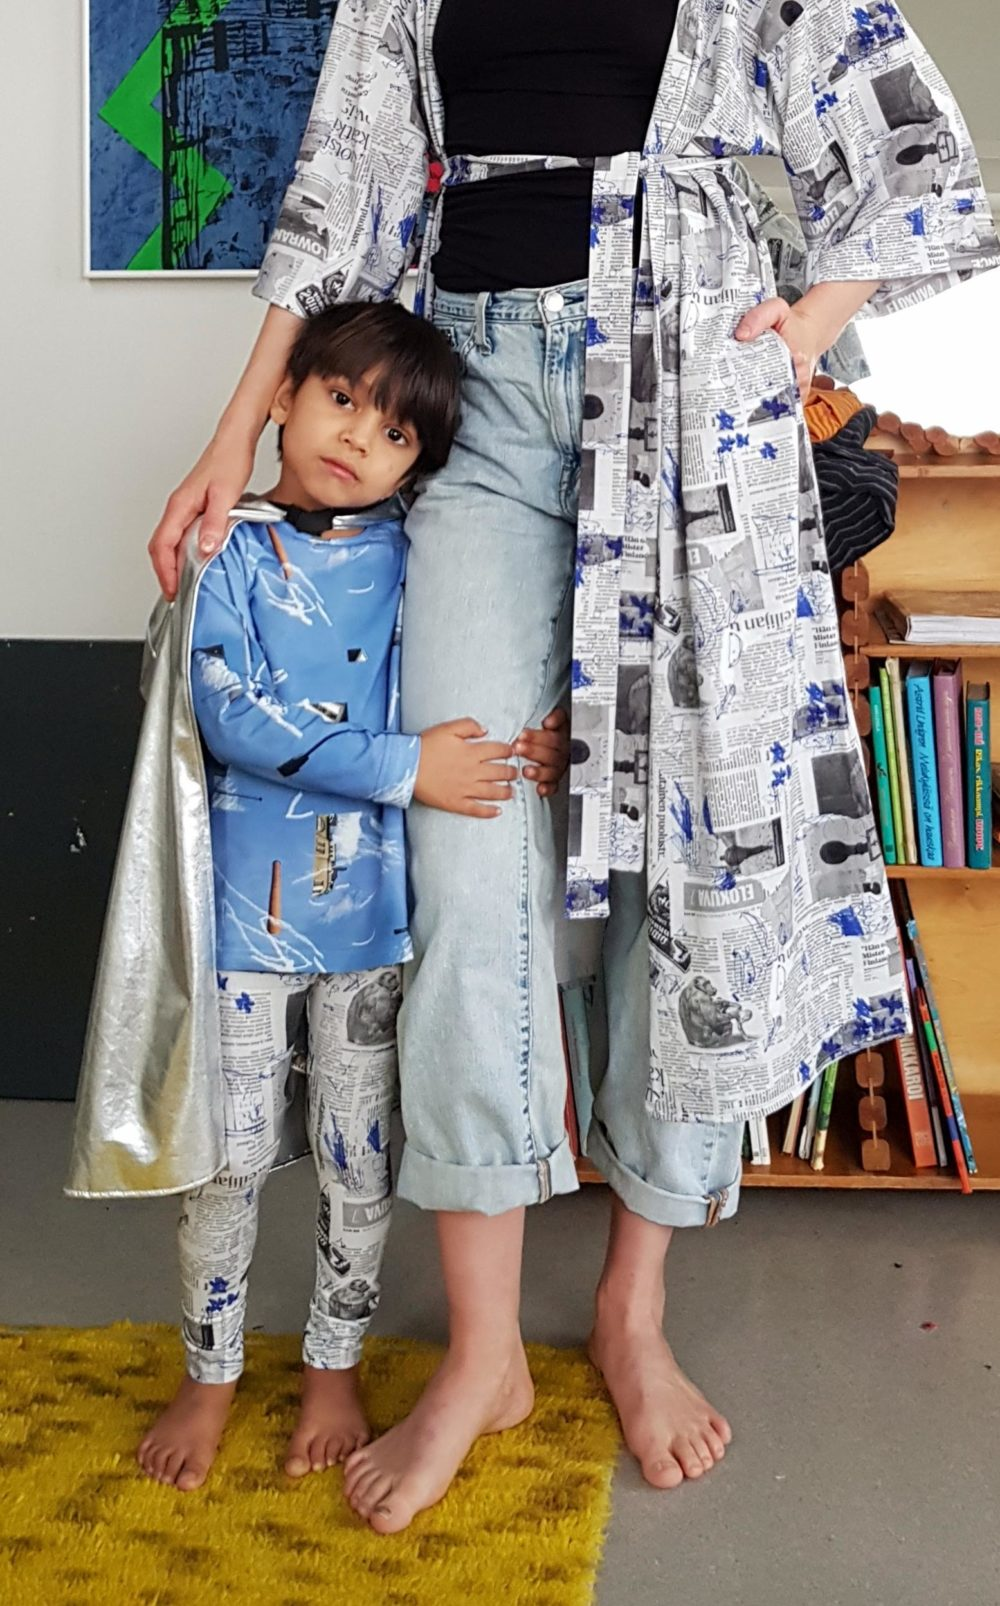 Vimma Long-Sleeve Shirt PAU liikennemerkki sininen 80-140cm - 80-140cm, blue, liikennemerkki, Long-Sleeve Shirt, PAU